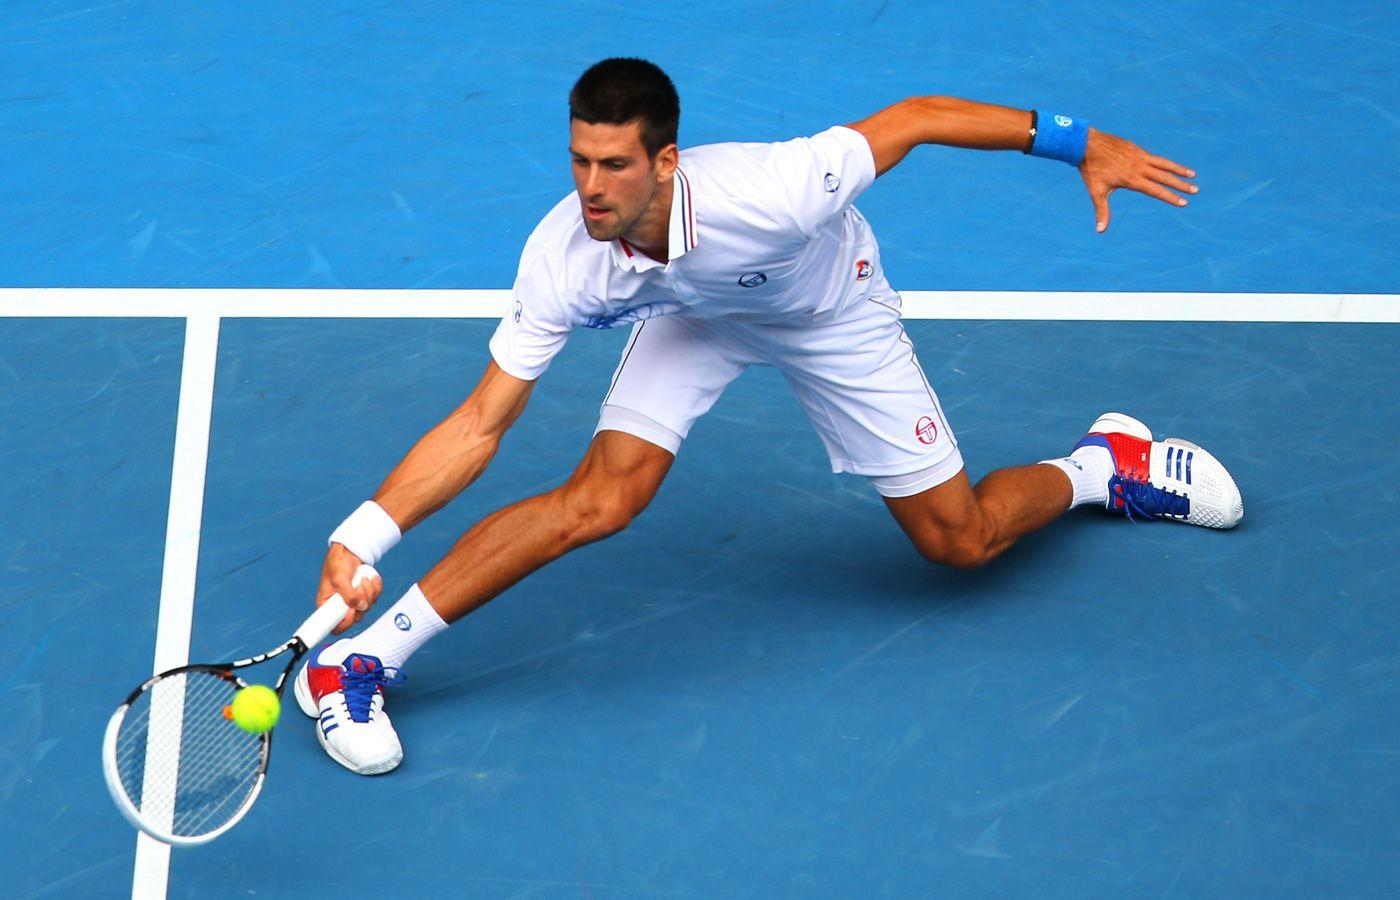 World Sports Hd Wallpapers: Novak Djokovic Hd Wallpapers